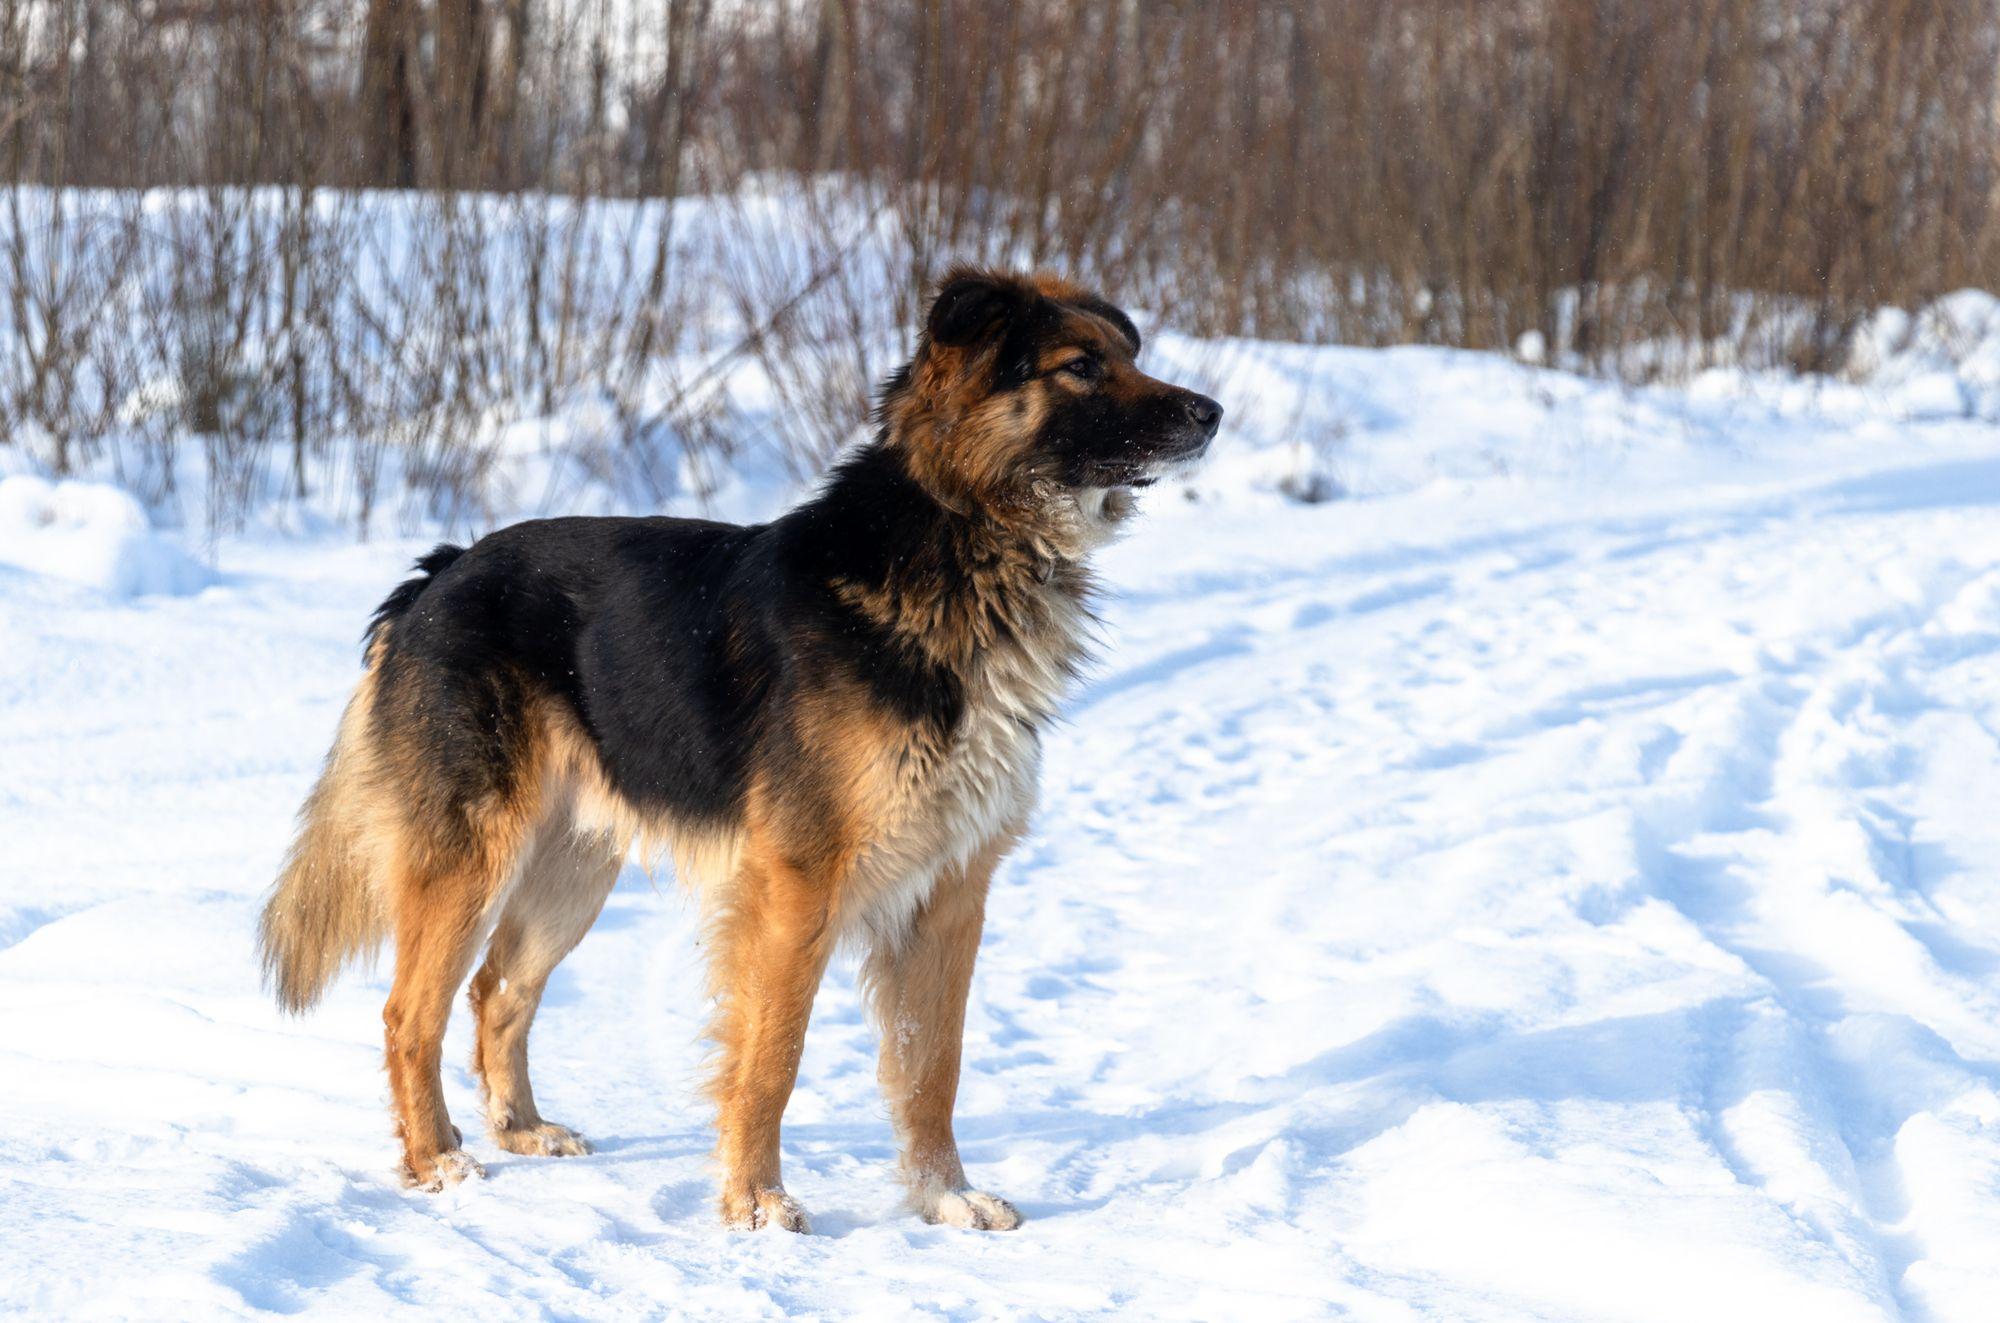 German Shepherd or Irish Setter… Why Not Both? Meet the German Shepherd Irish Setter Mix.